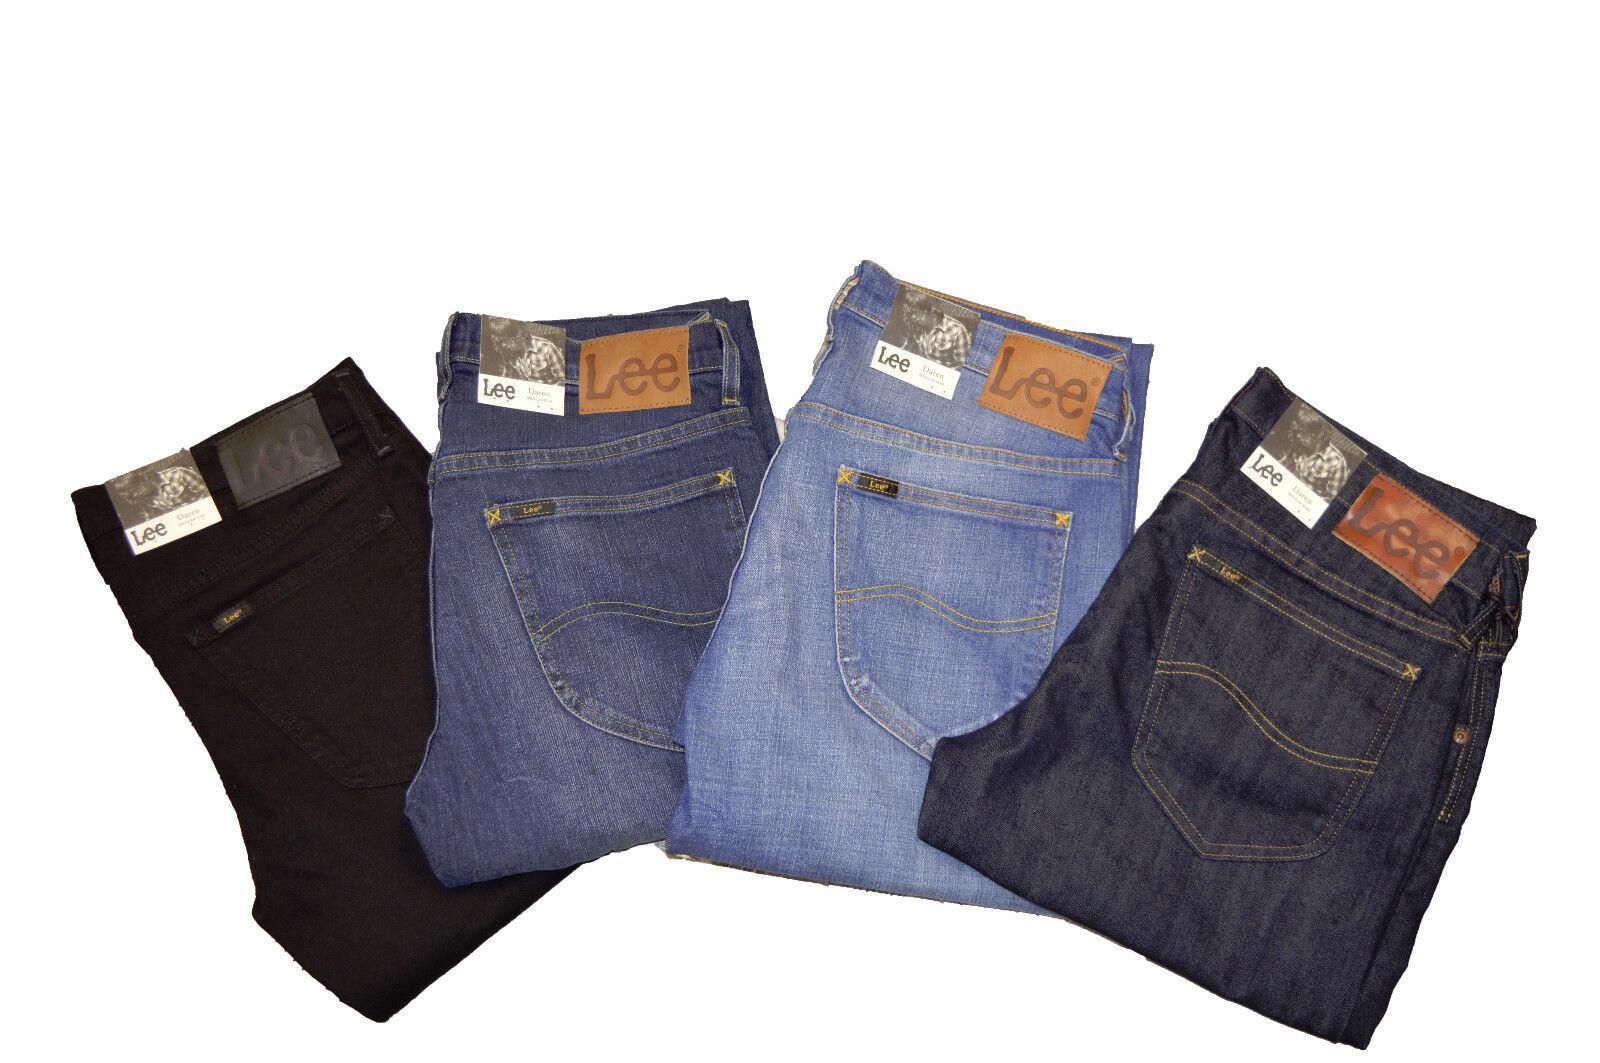 Lee Mens Jeans Daren Designer Pants Denim Trousers Trend Men New